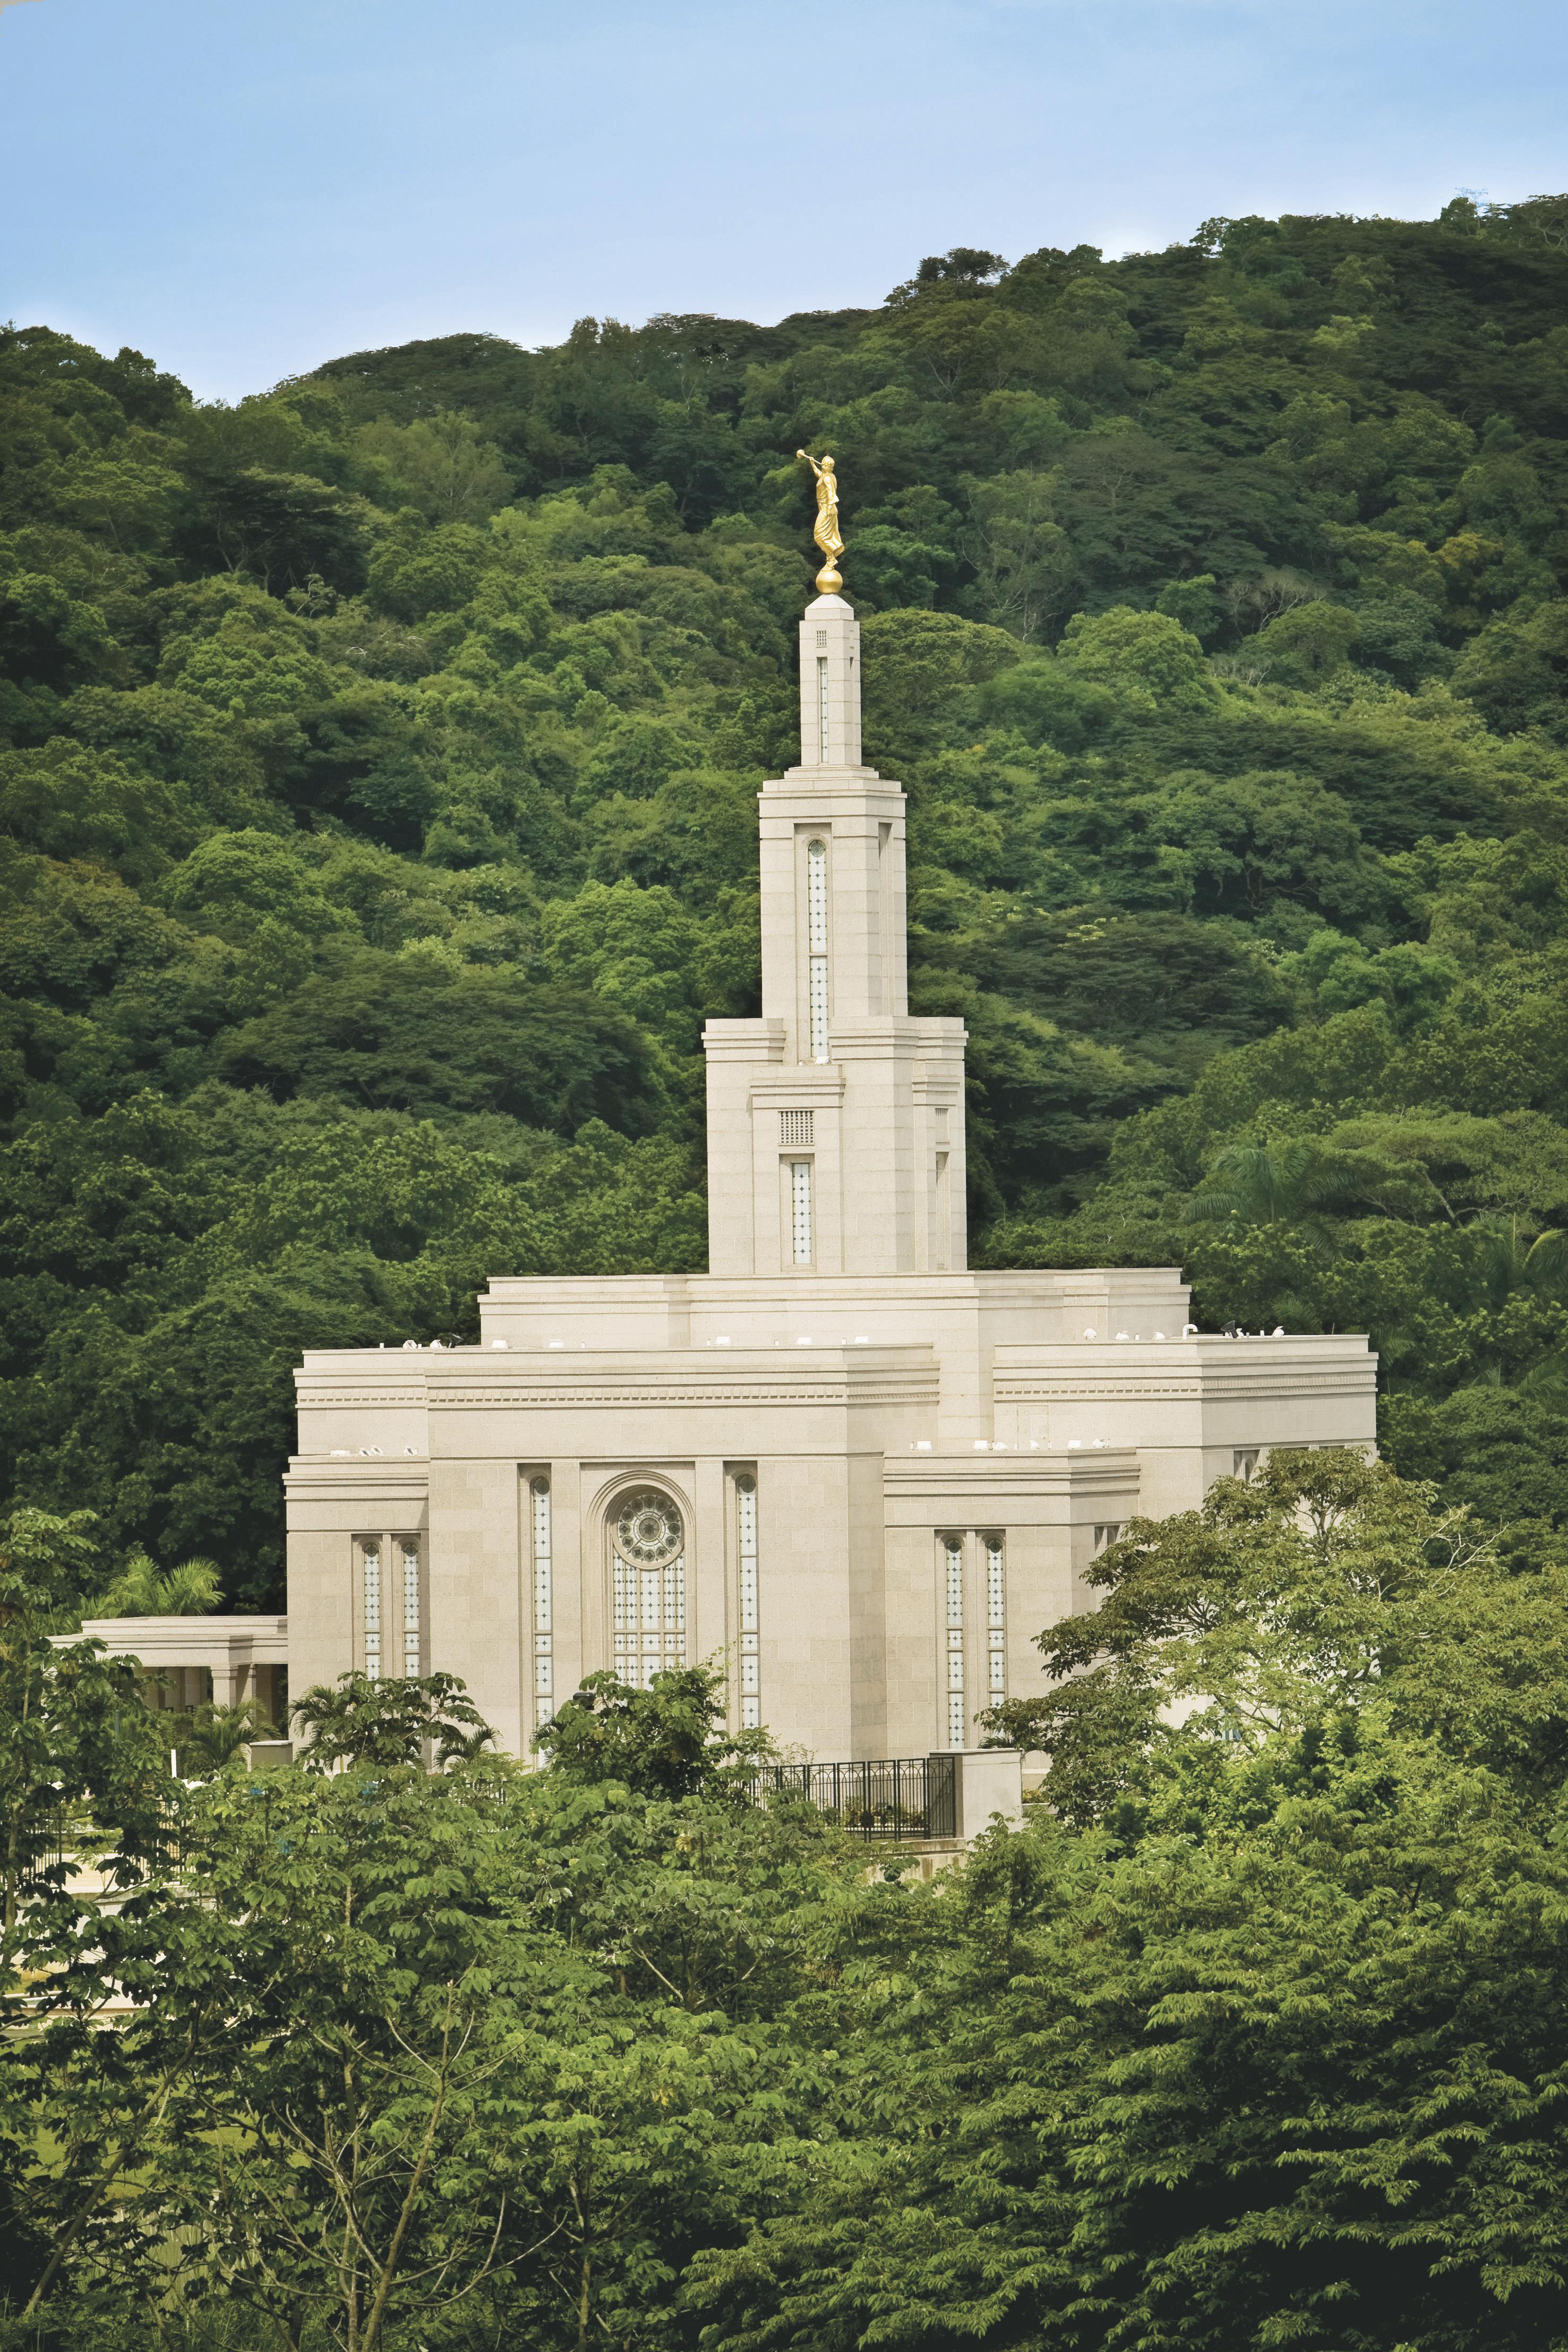 The Panama City Panama Temple exterior, including scenery.